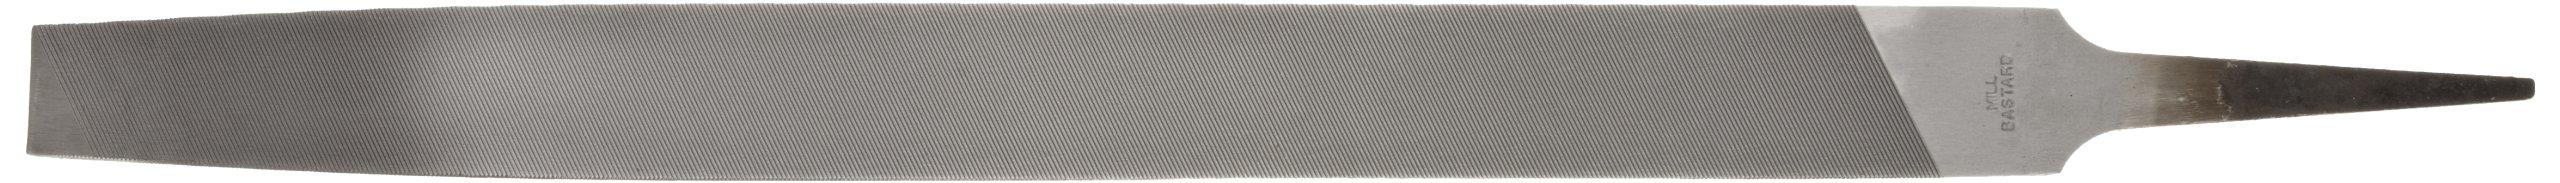 Nicholson Mill Hand File, American Pattern, Single Cut, Rectangular, Fine, 14'' Length